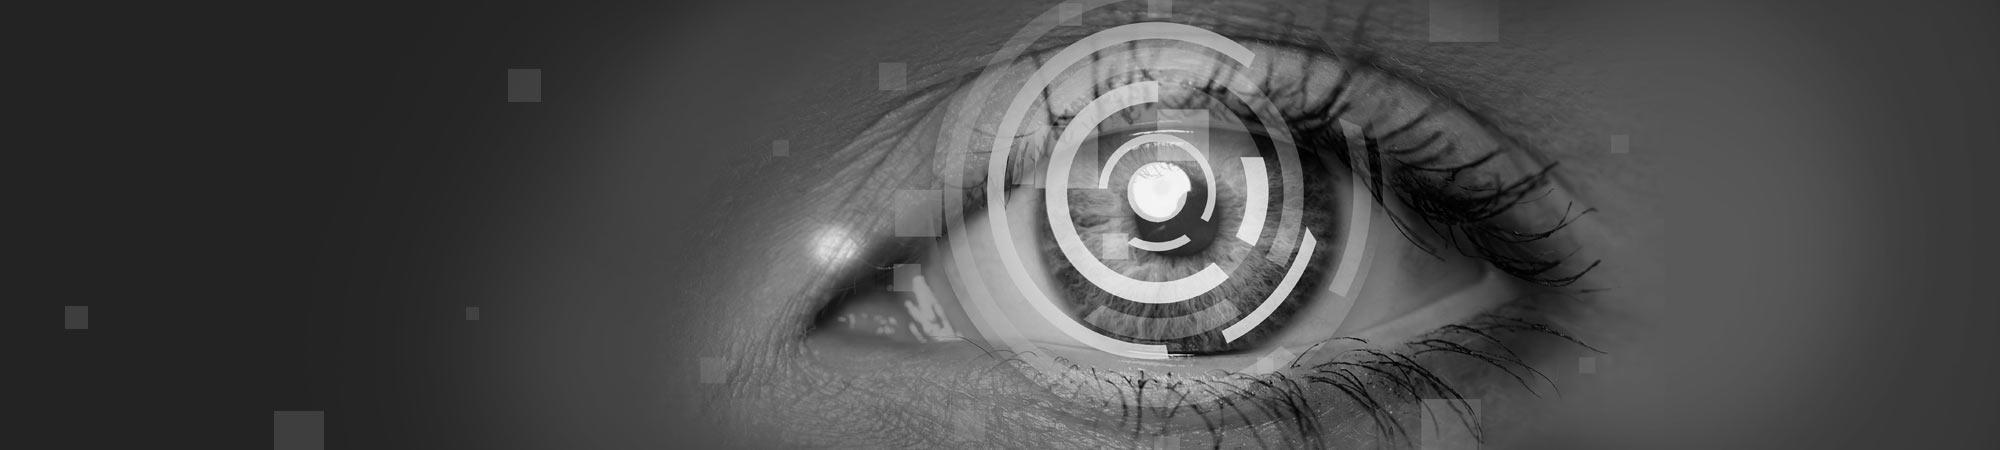 DrkH-Ch-cataract-eye